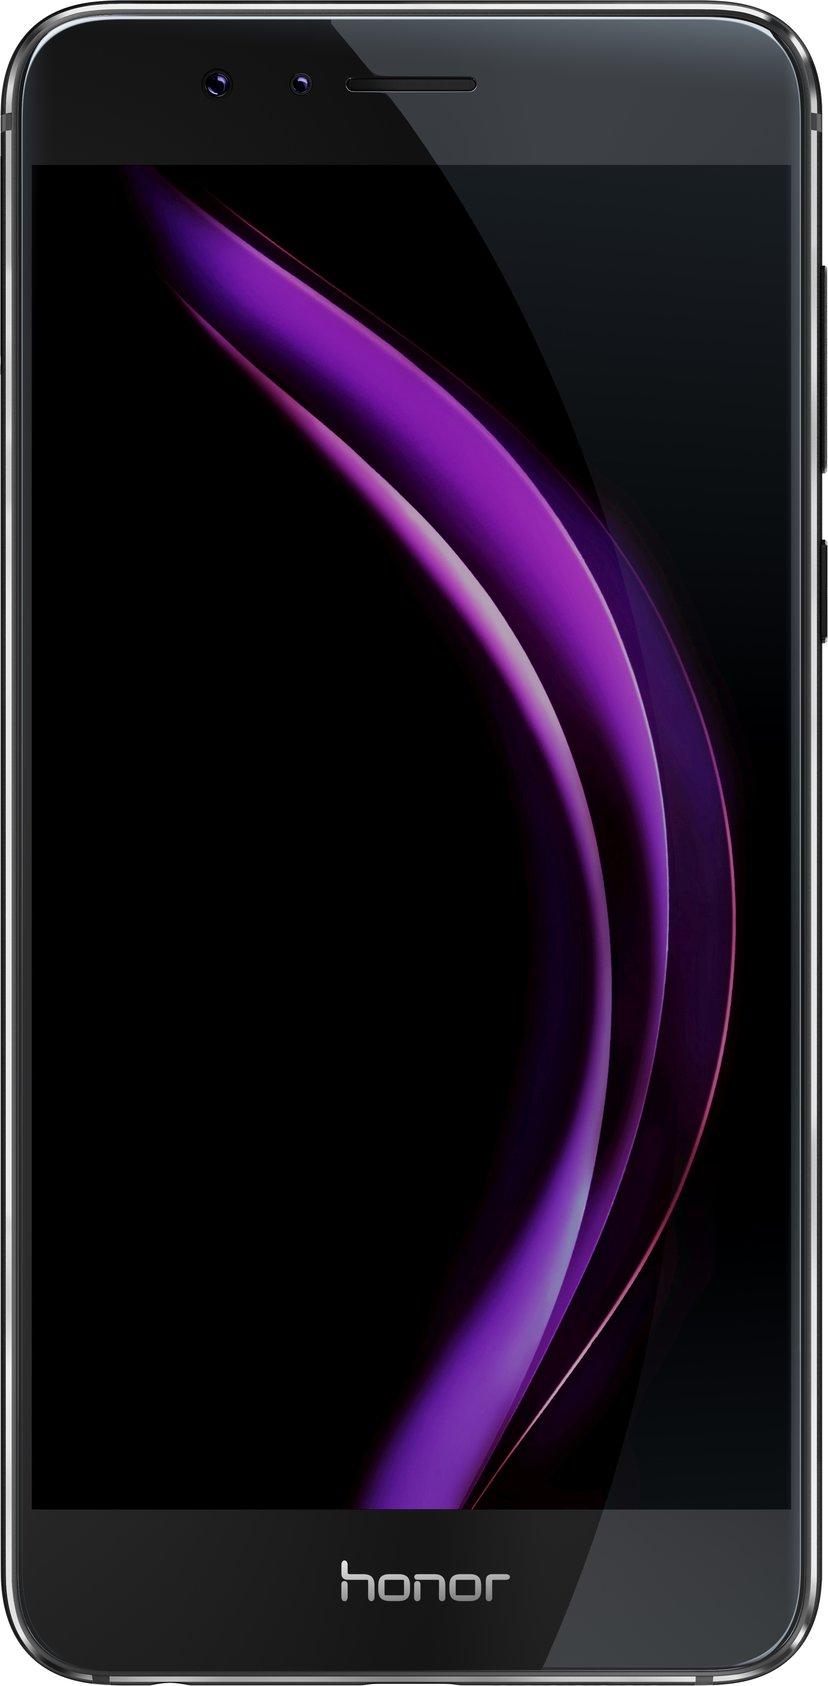 Huawei Honor 8 Standard 32GB Dual-SIM Midnattssvart